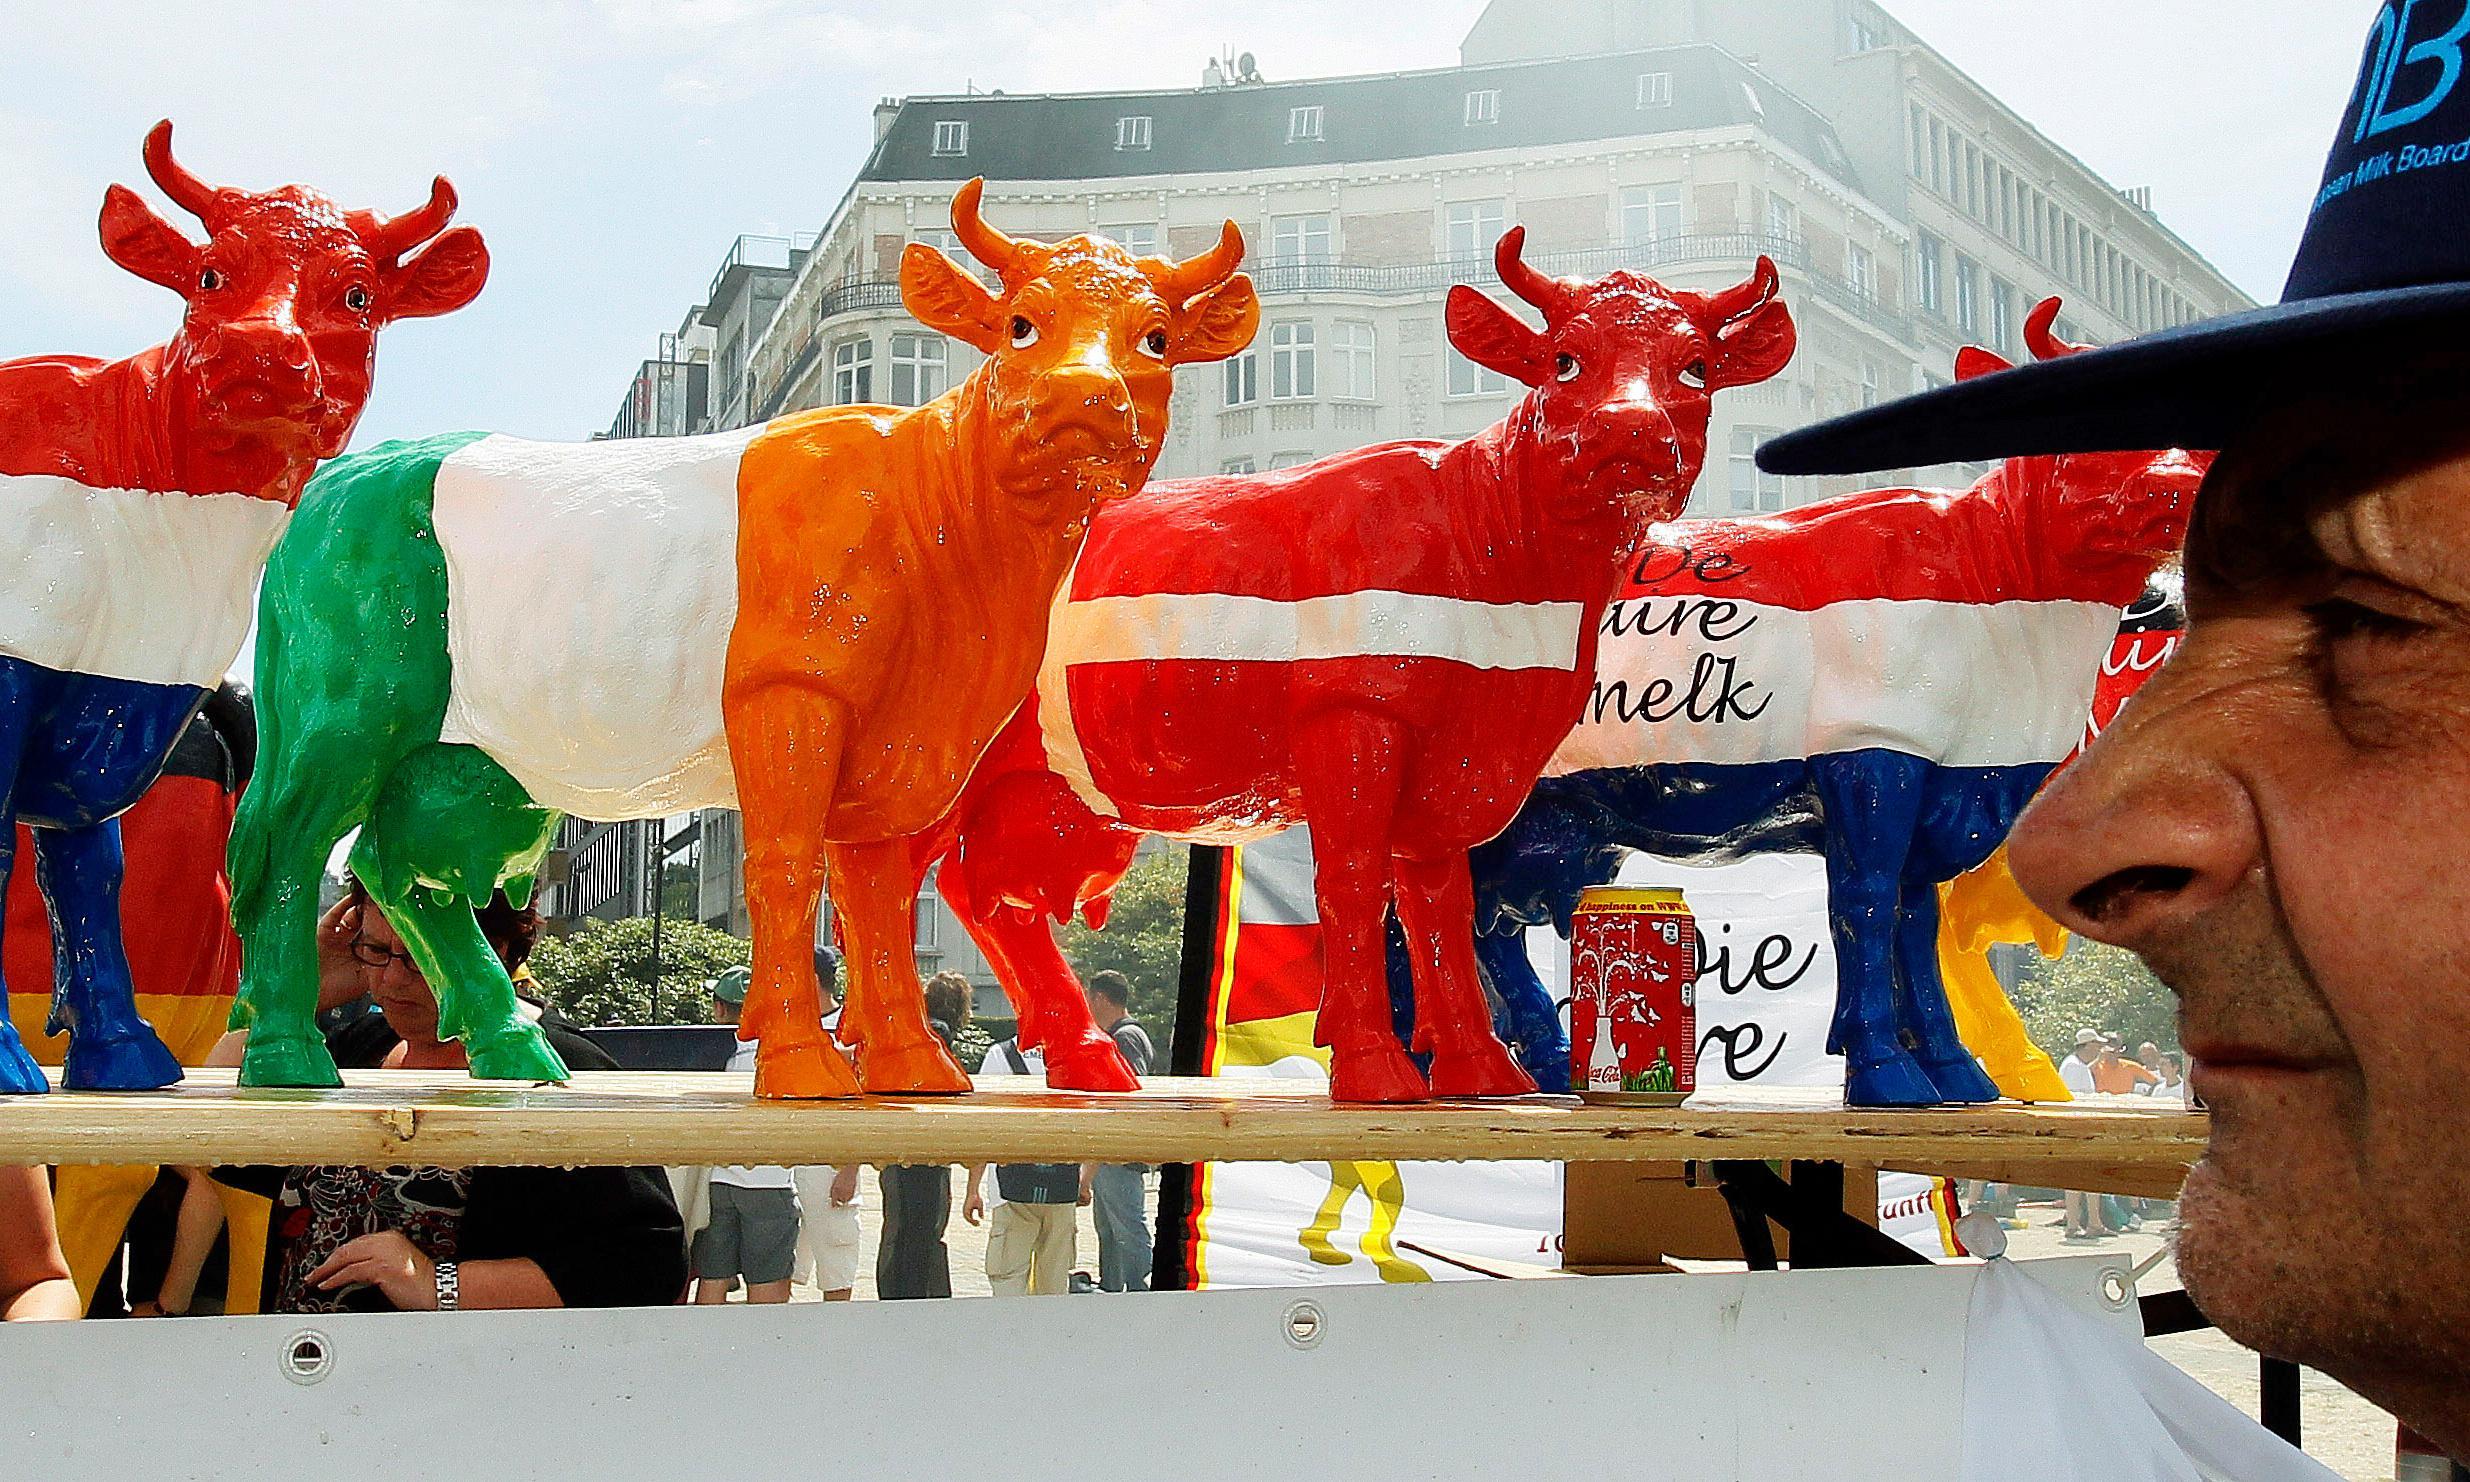 EU ignoring climate crisis with livestock farm subsidies, campaigners warn